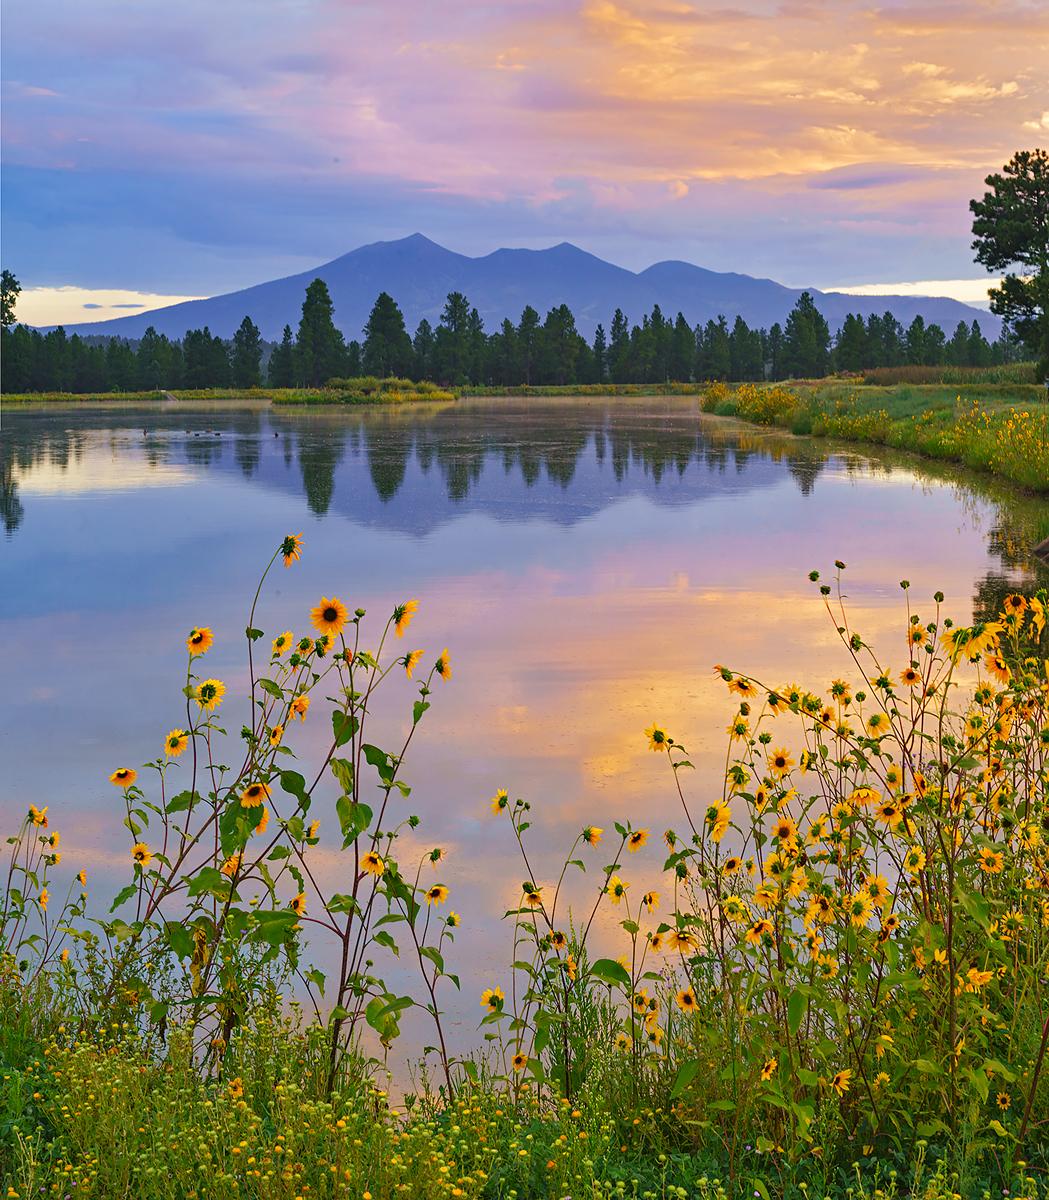 Kachina wetlands, sunrise, sunflower, San Francisco Peaks, Arizona, Flagstaff, photo